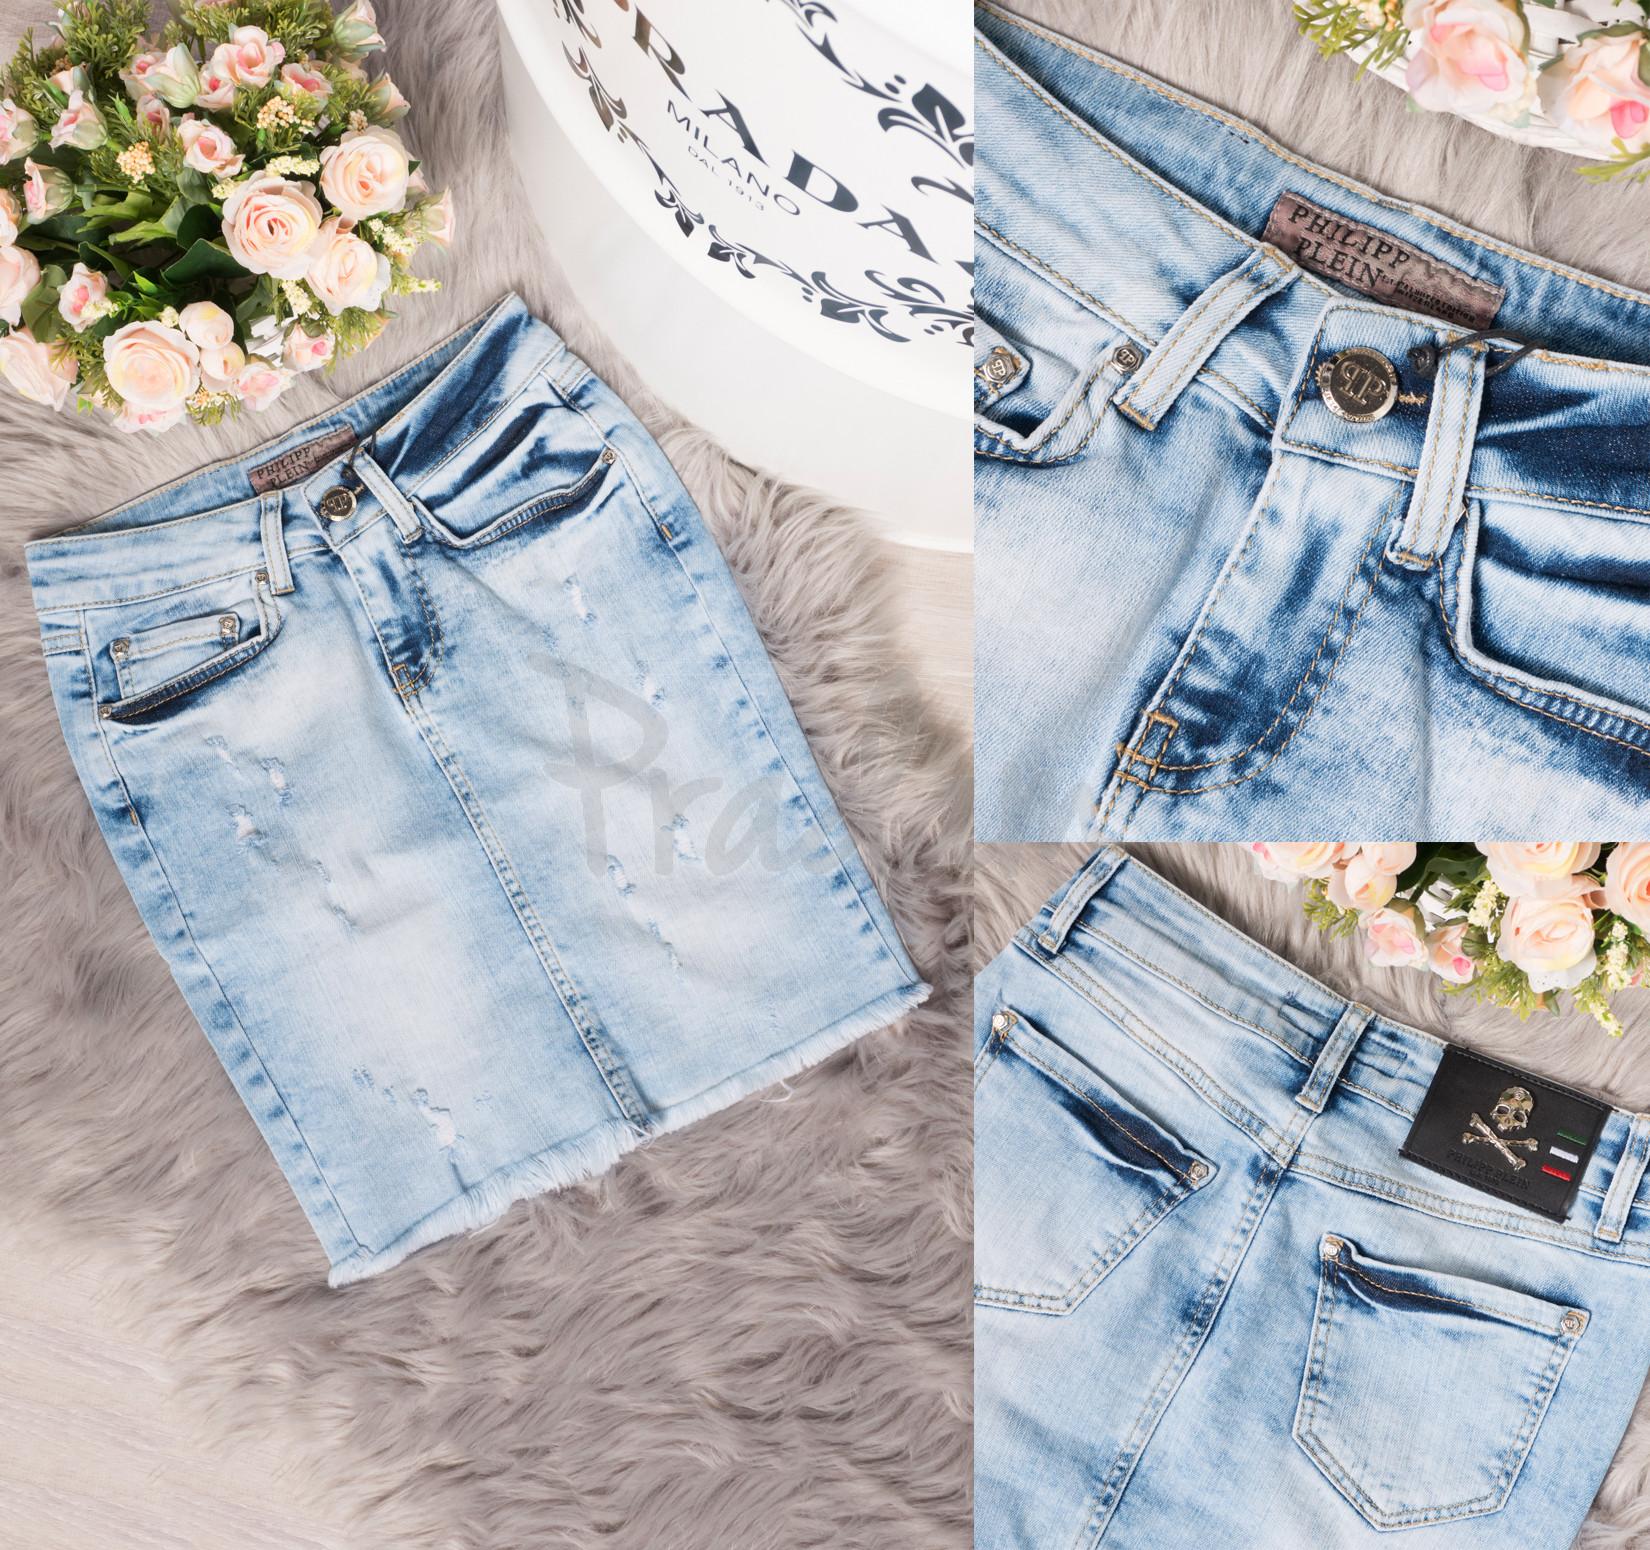 0772 Philipp Plein юбка джинсовая с царапками летняя стрейчевая (26-30, 5 ед.)